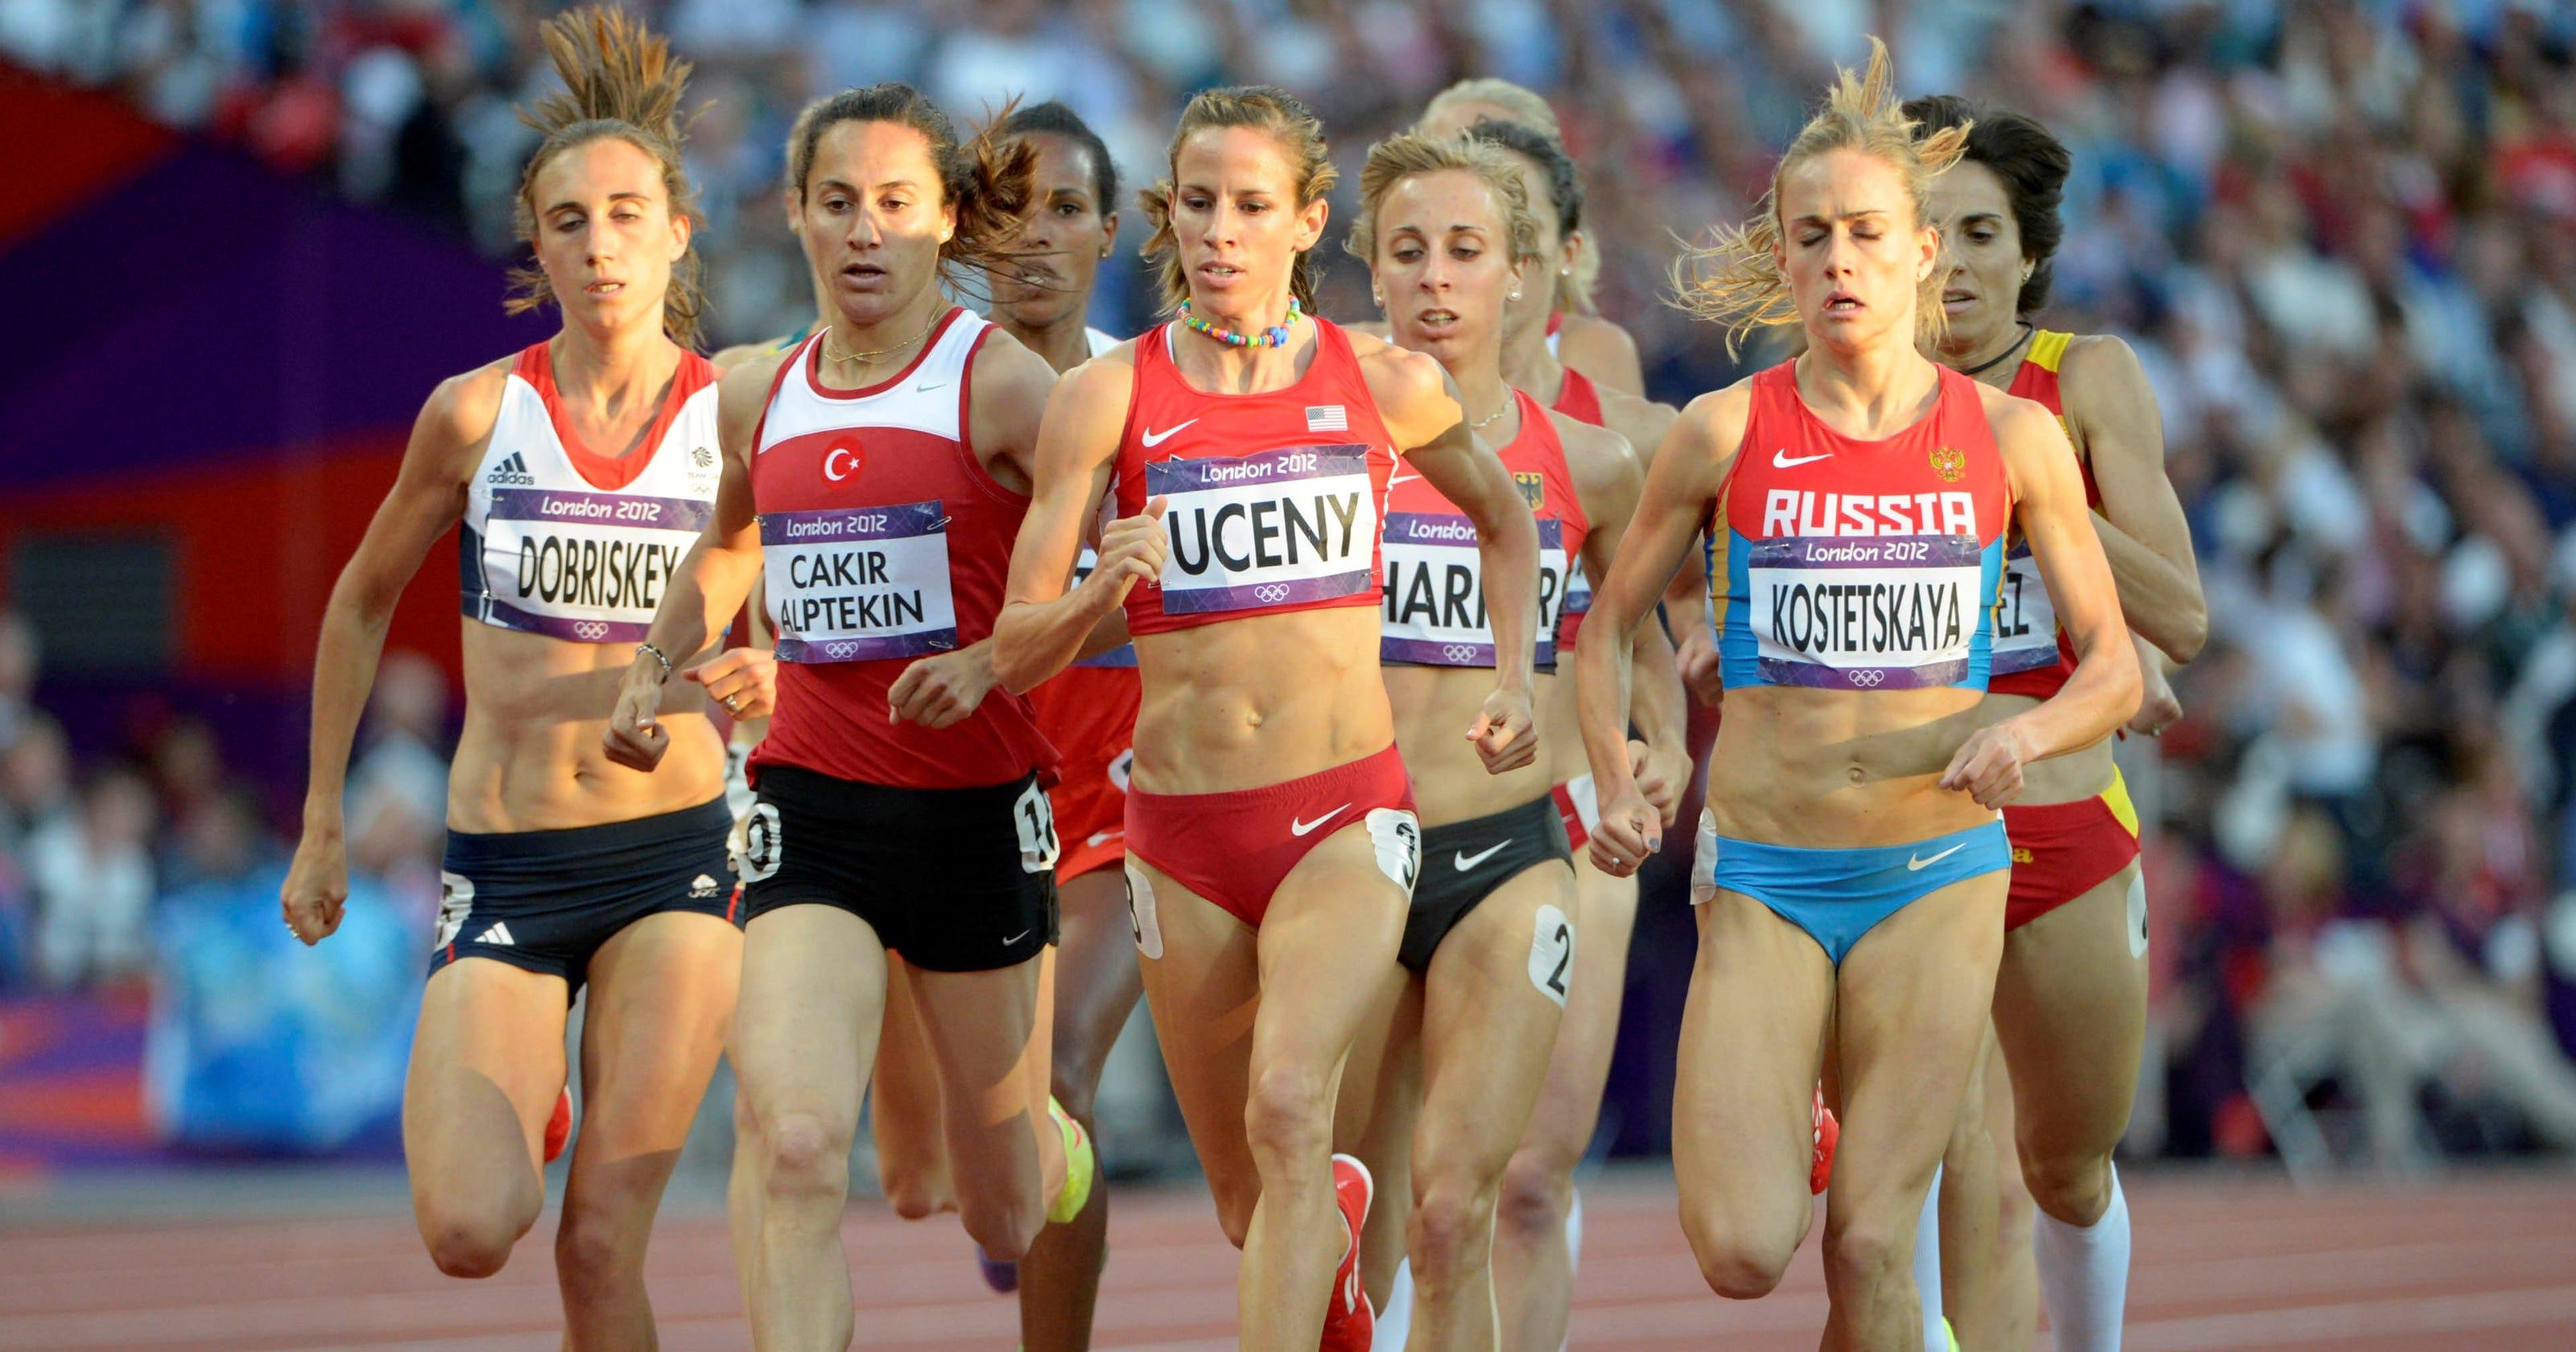 HIGH SCHOOL ROUNDUP: Somerset Berkley girls track and